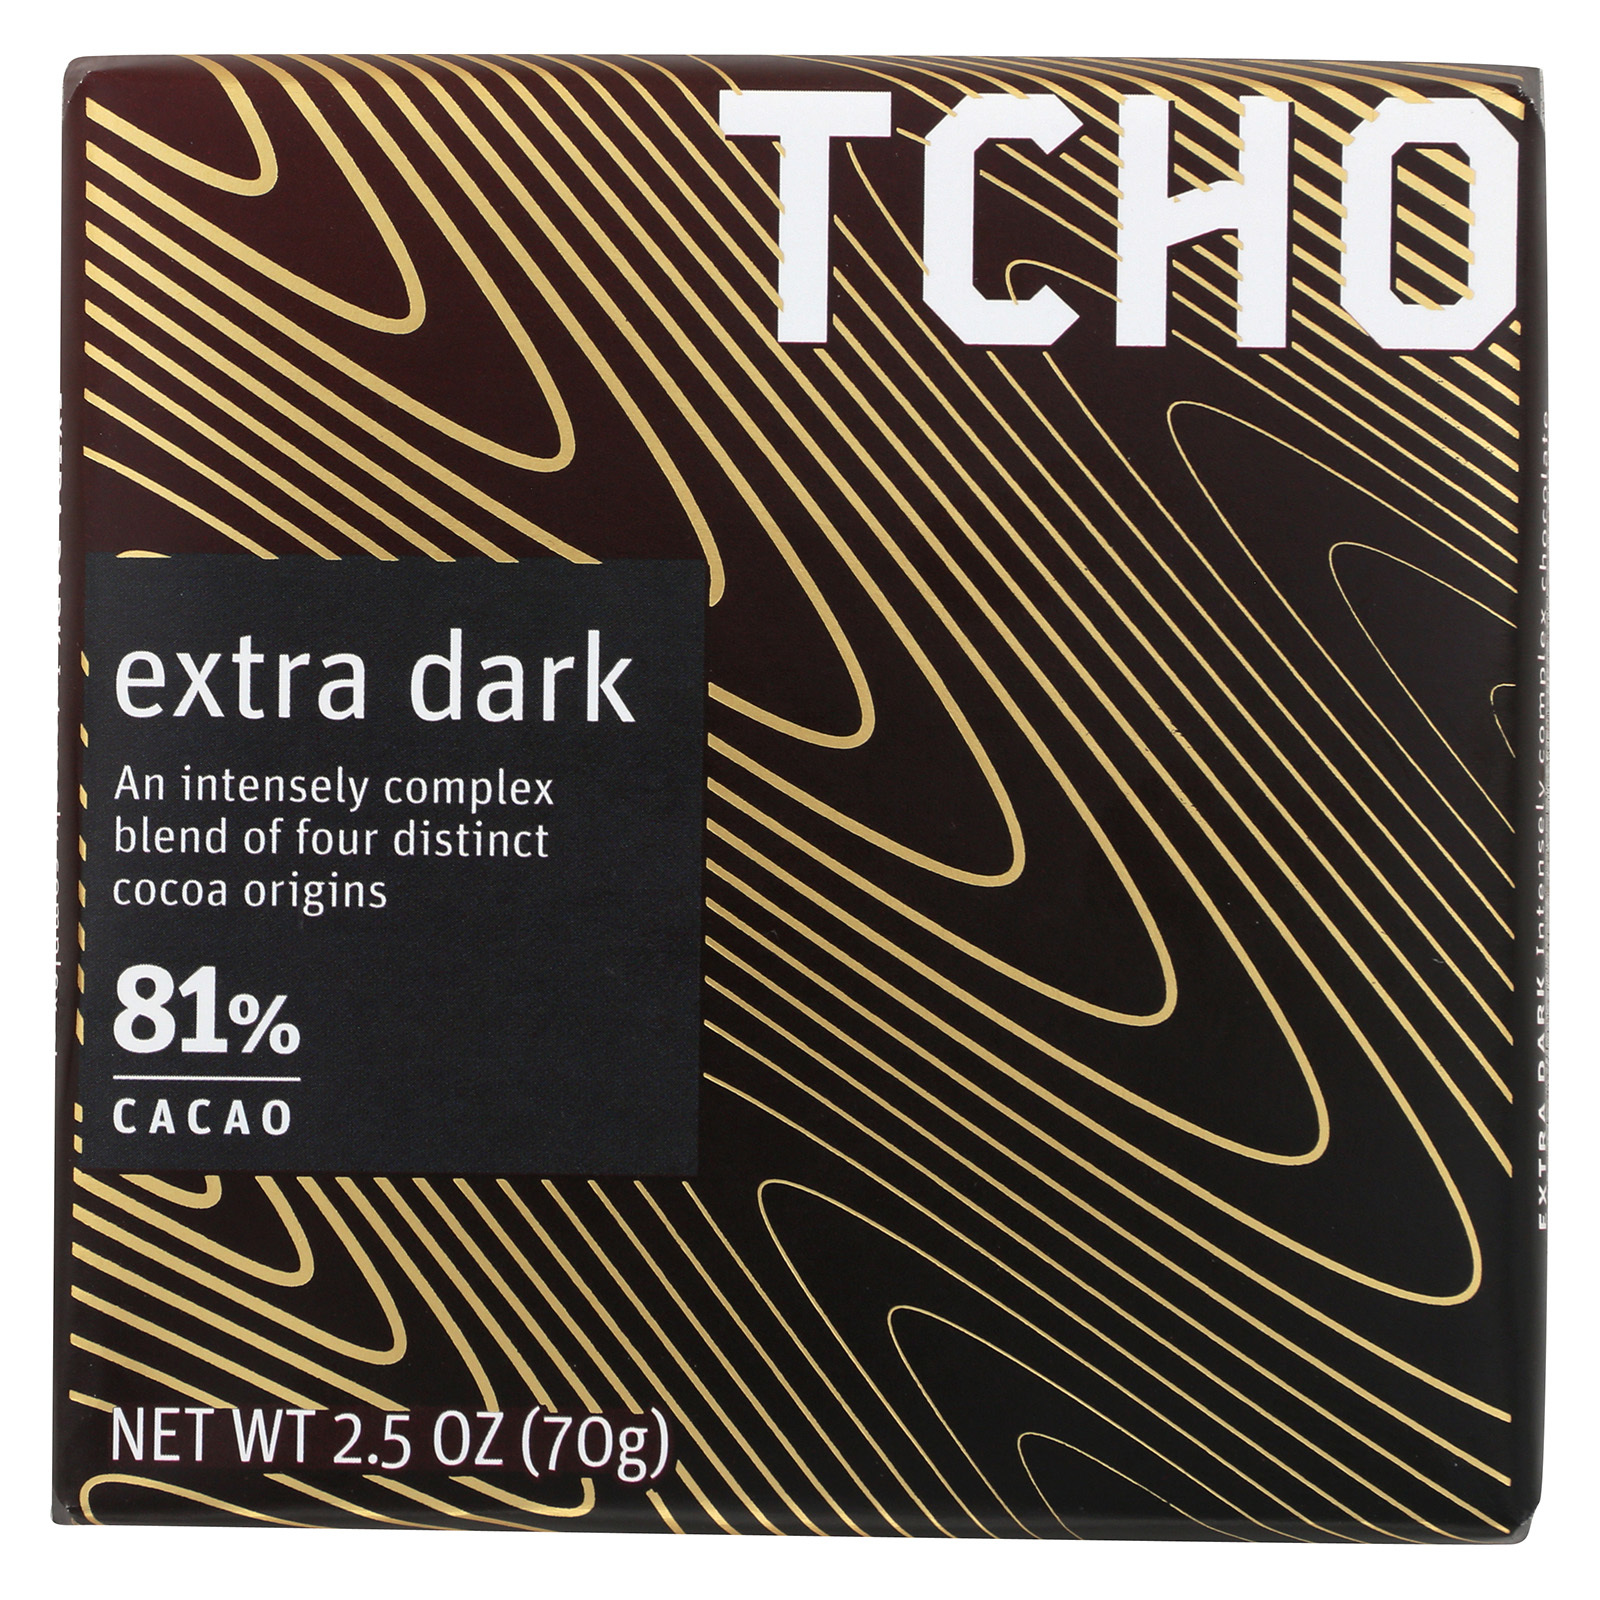 Tcho Chocolate Dark Chocolate Bar - Extra Dark 81 Percent Cacao - Case of 12 - 2.5 oz.